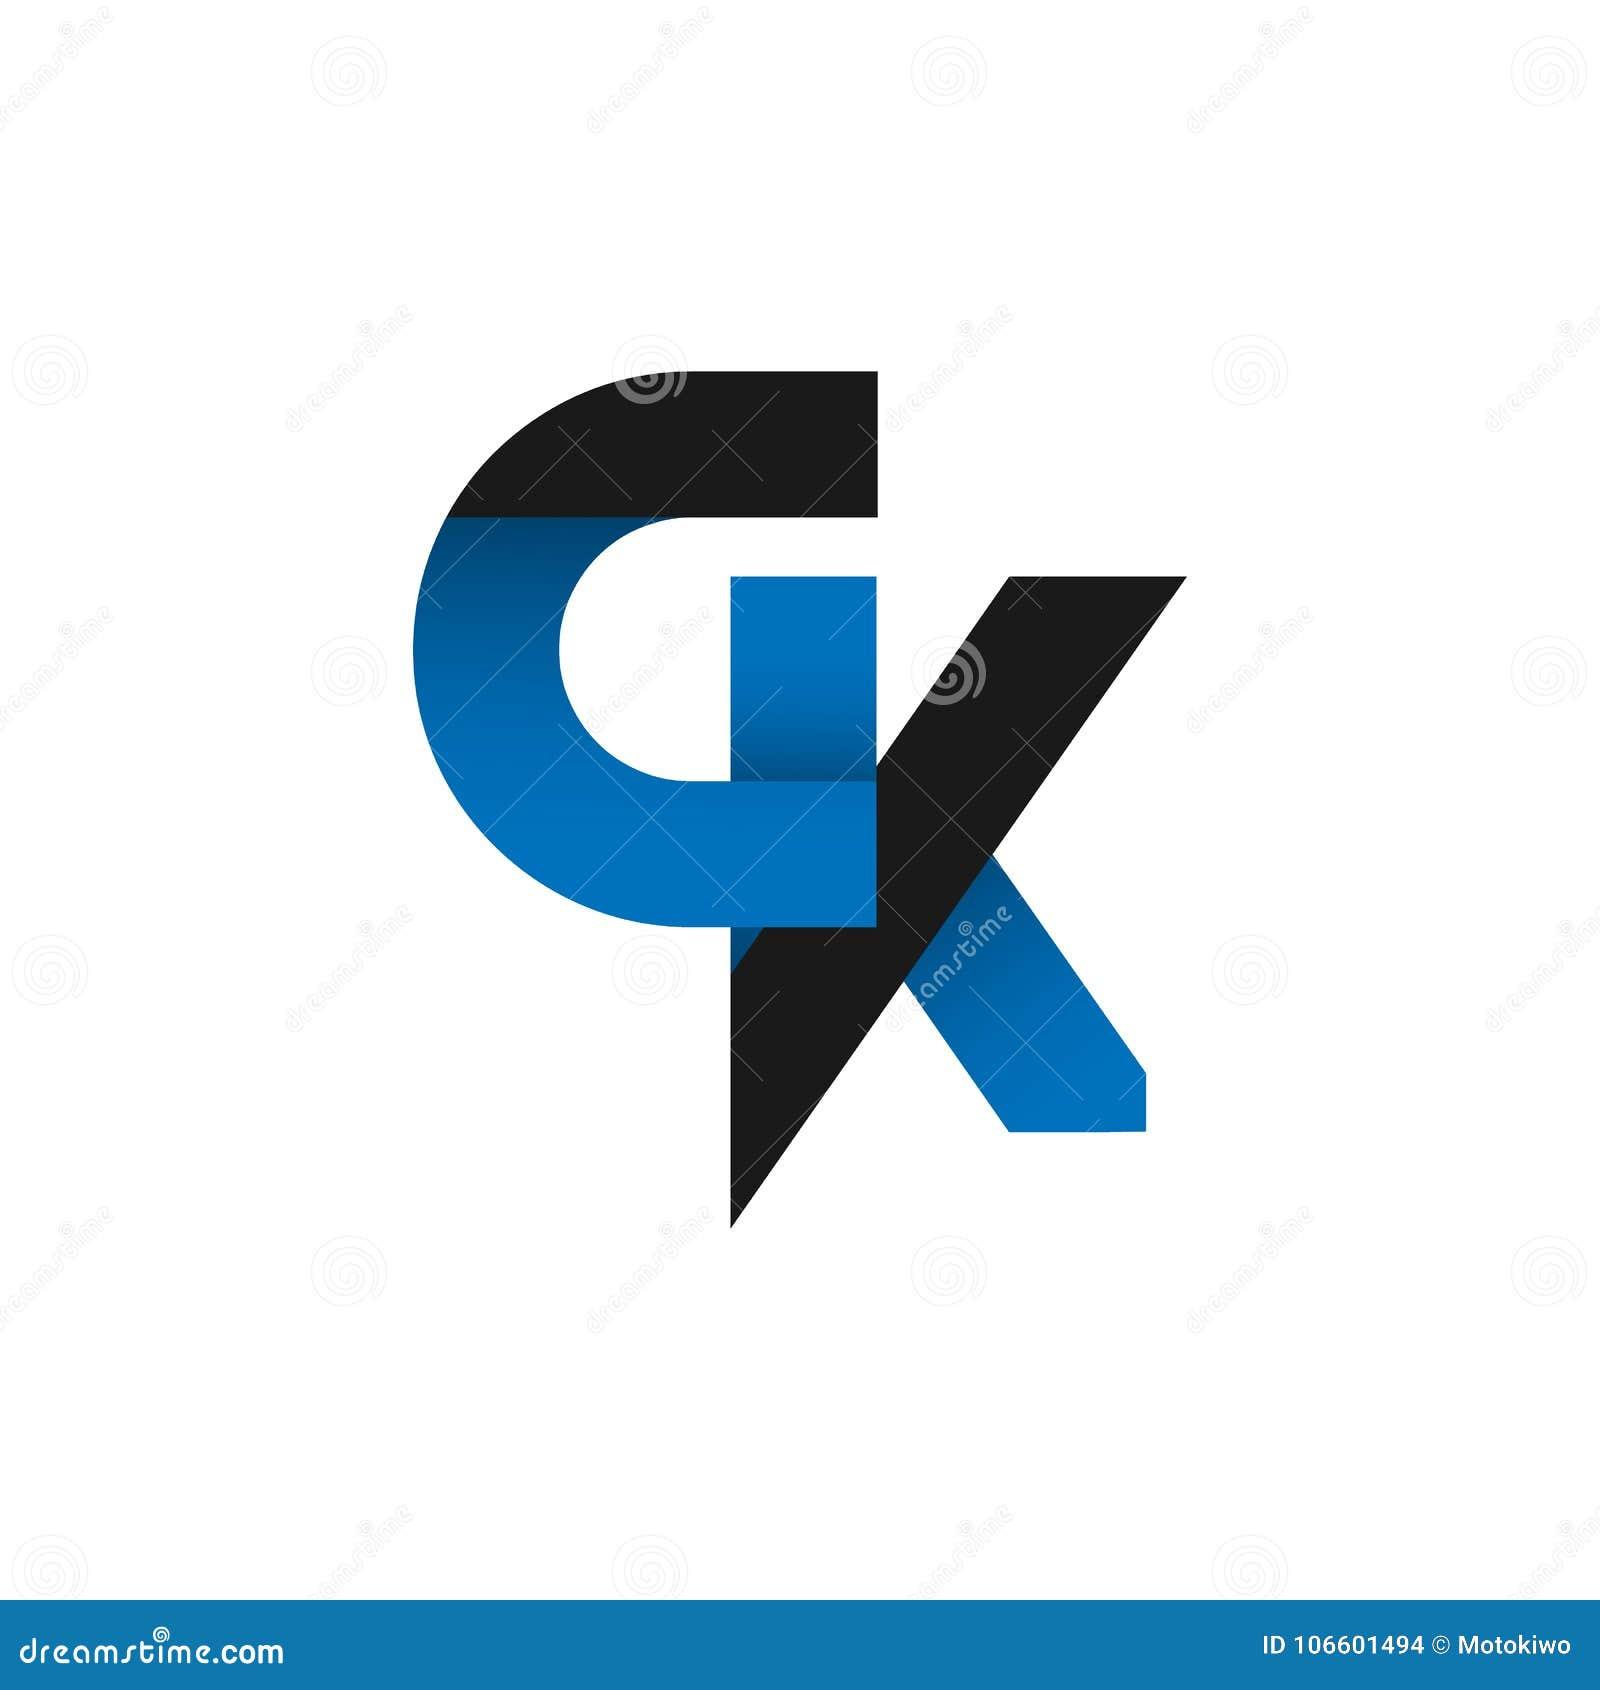 abstract letter gk logo design idea stock illustration rh dreamstime com gk logistics tracking gk logistics